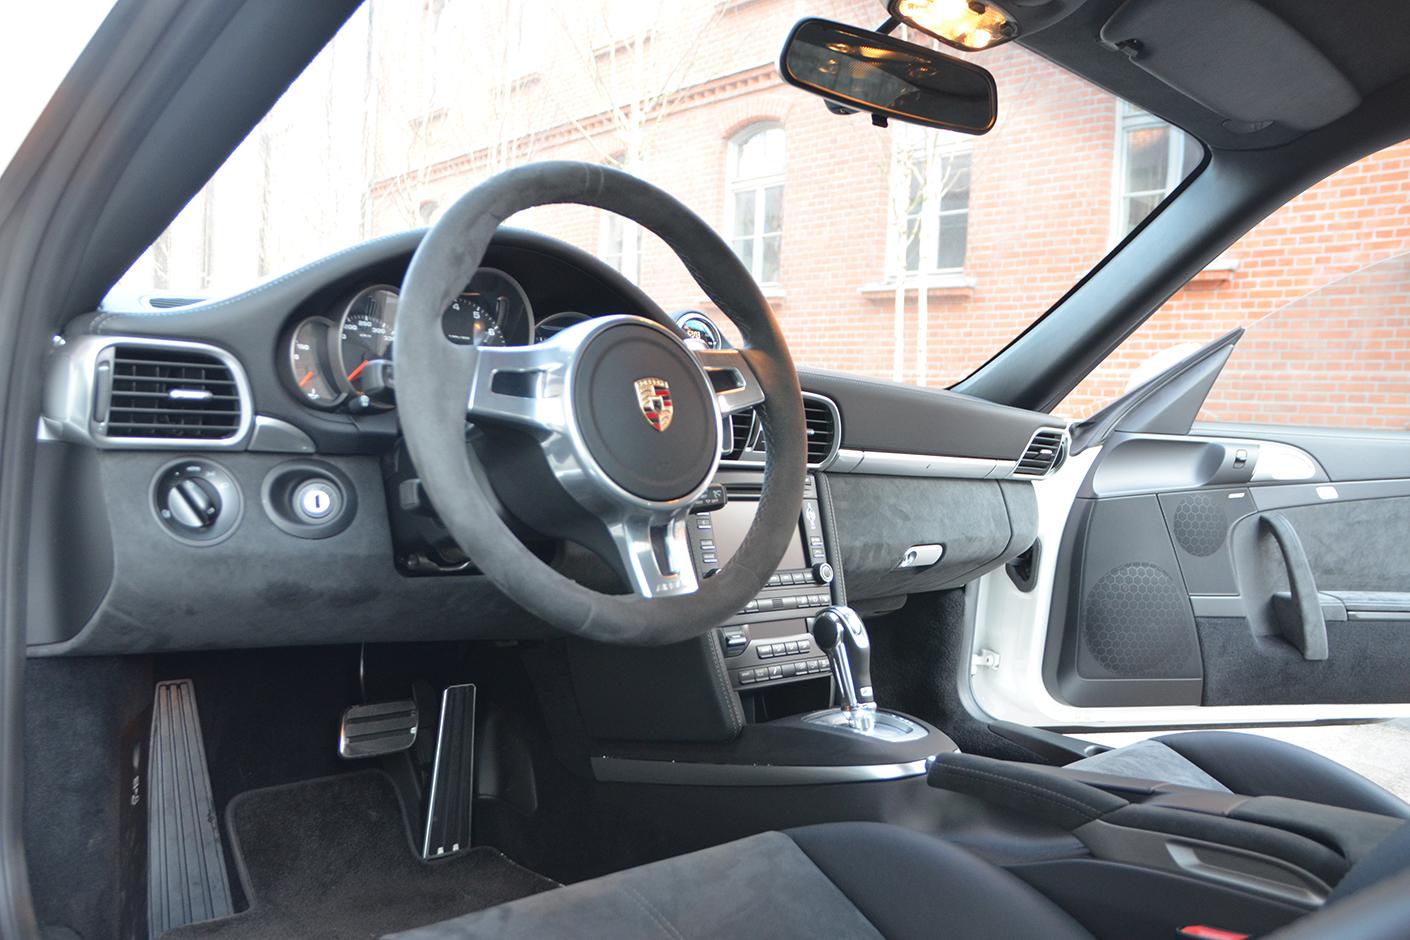 Porsche 997 Carrera GTS 2011-11